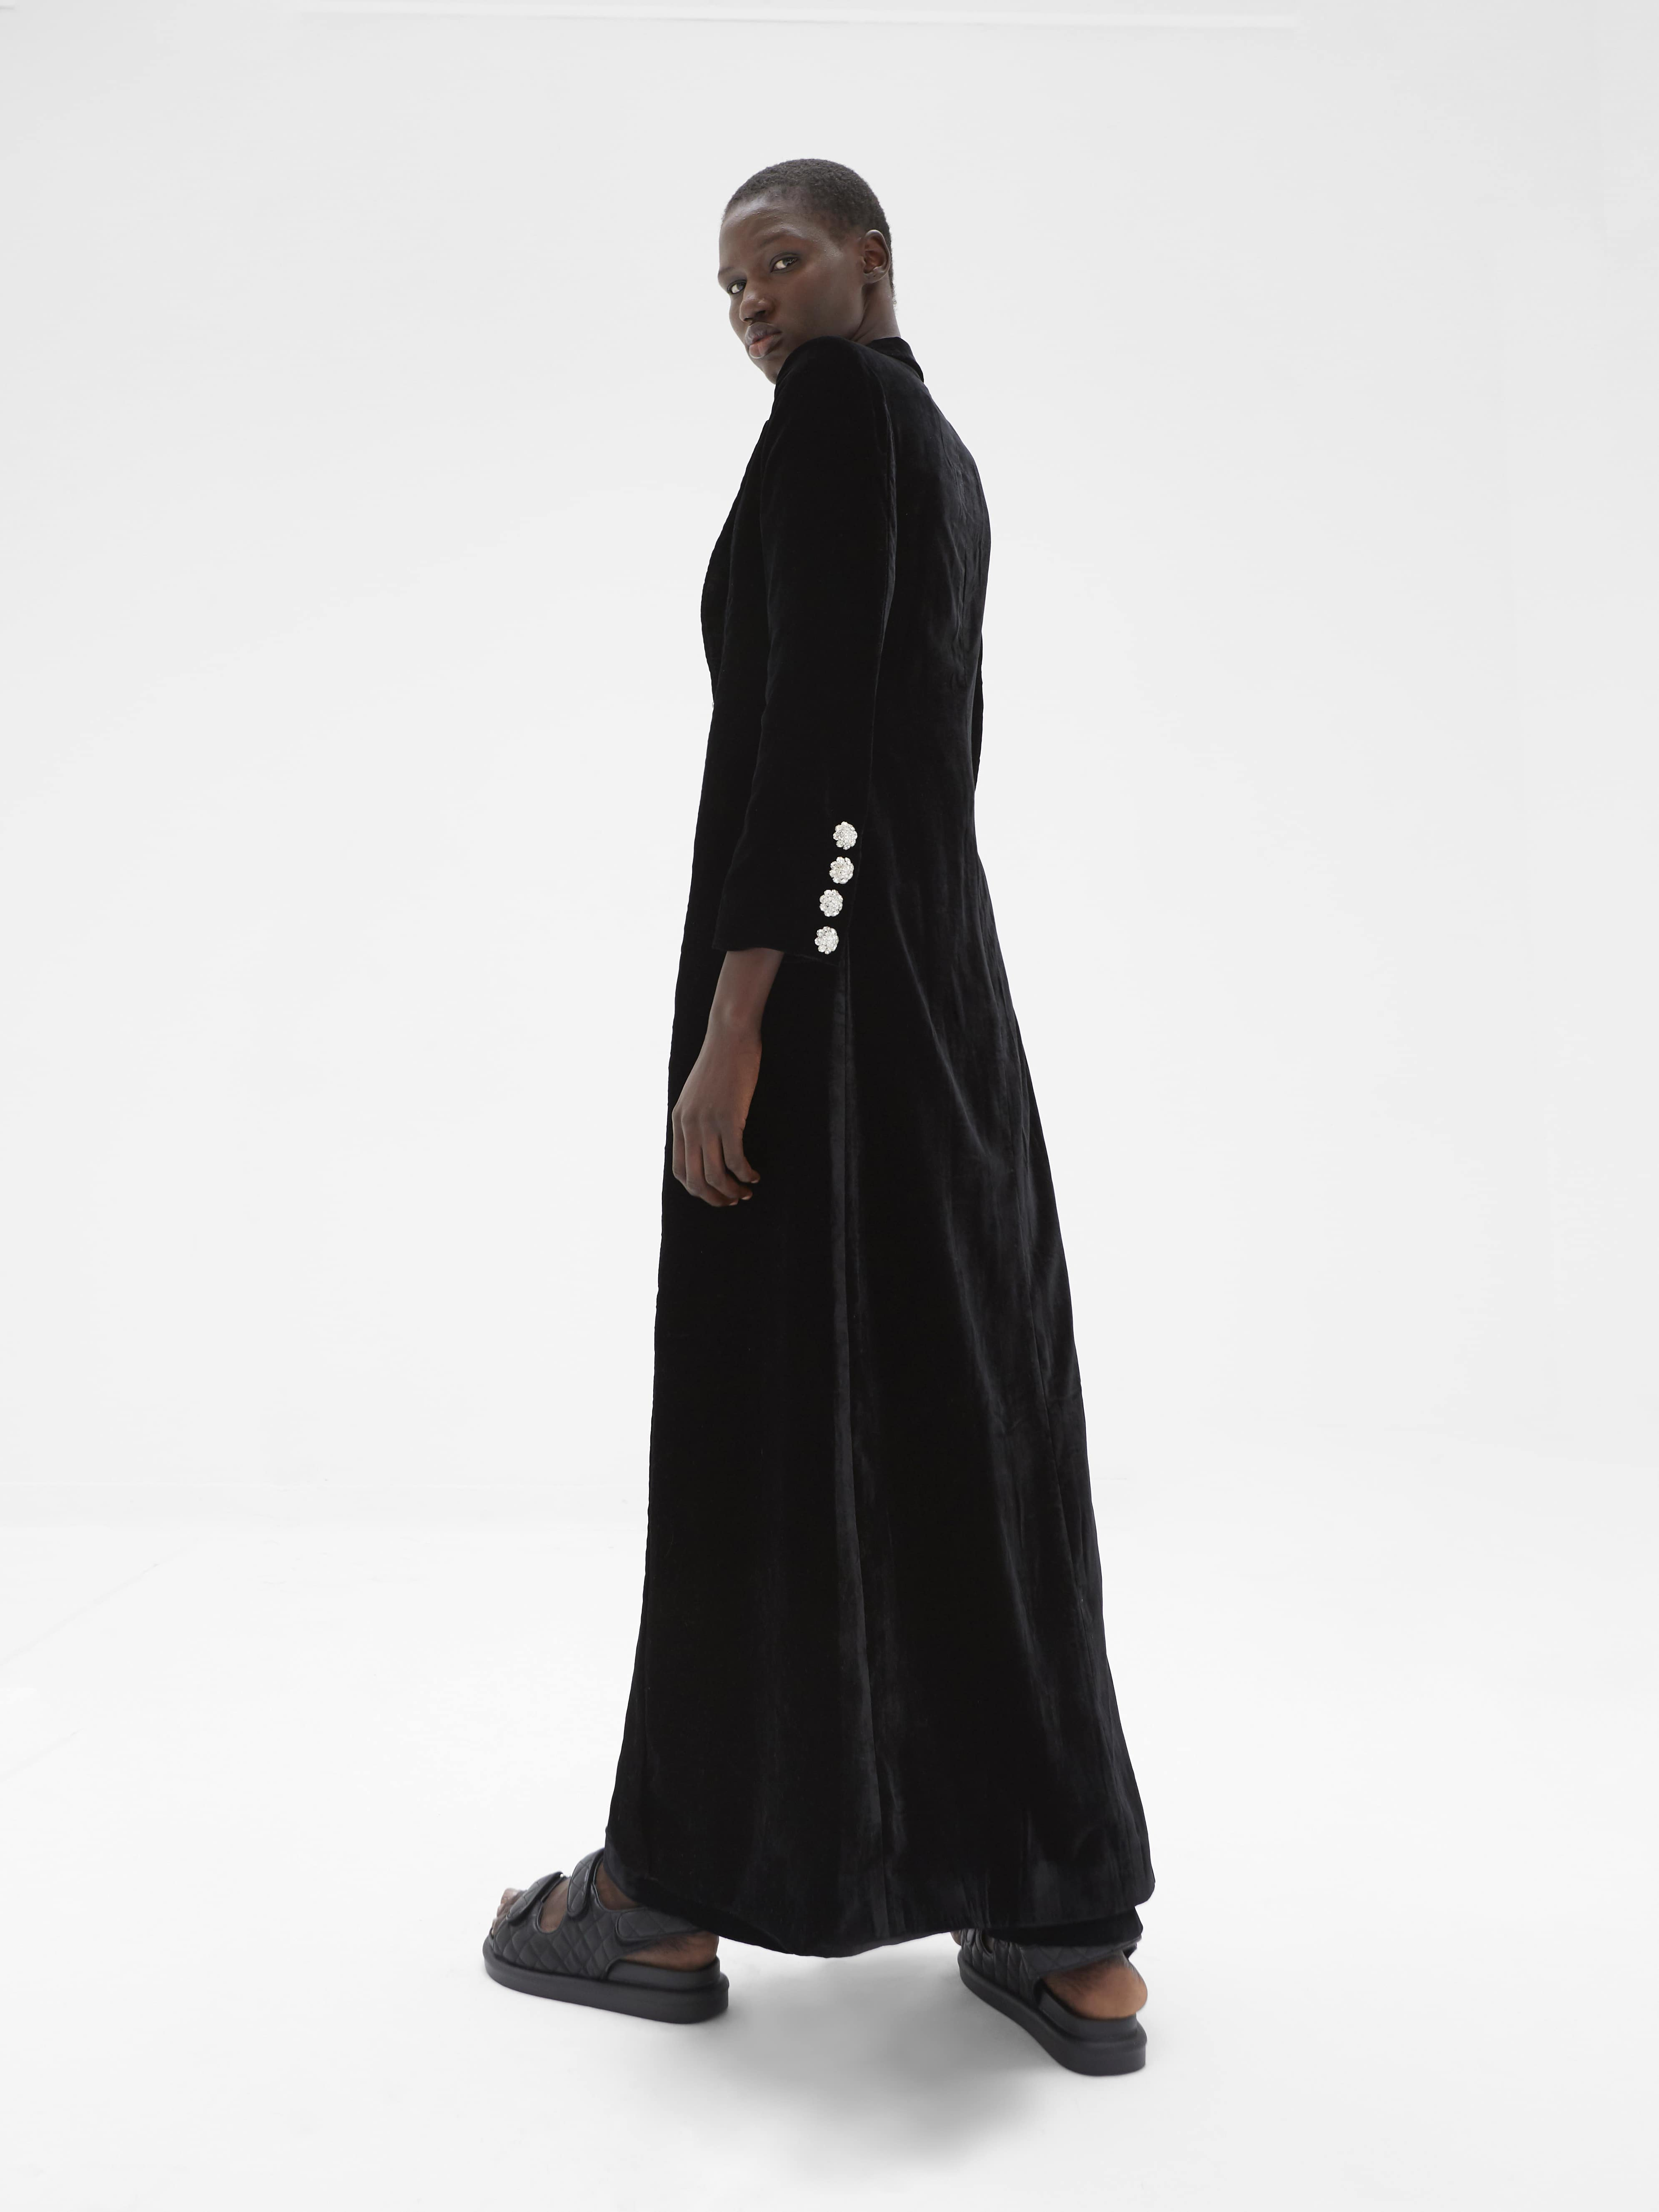 View 2 of model wearing Kezia Kimono in black.